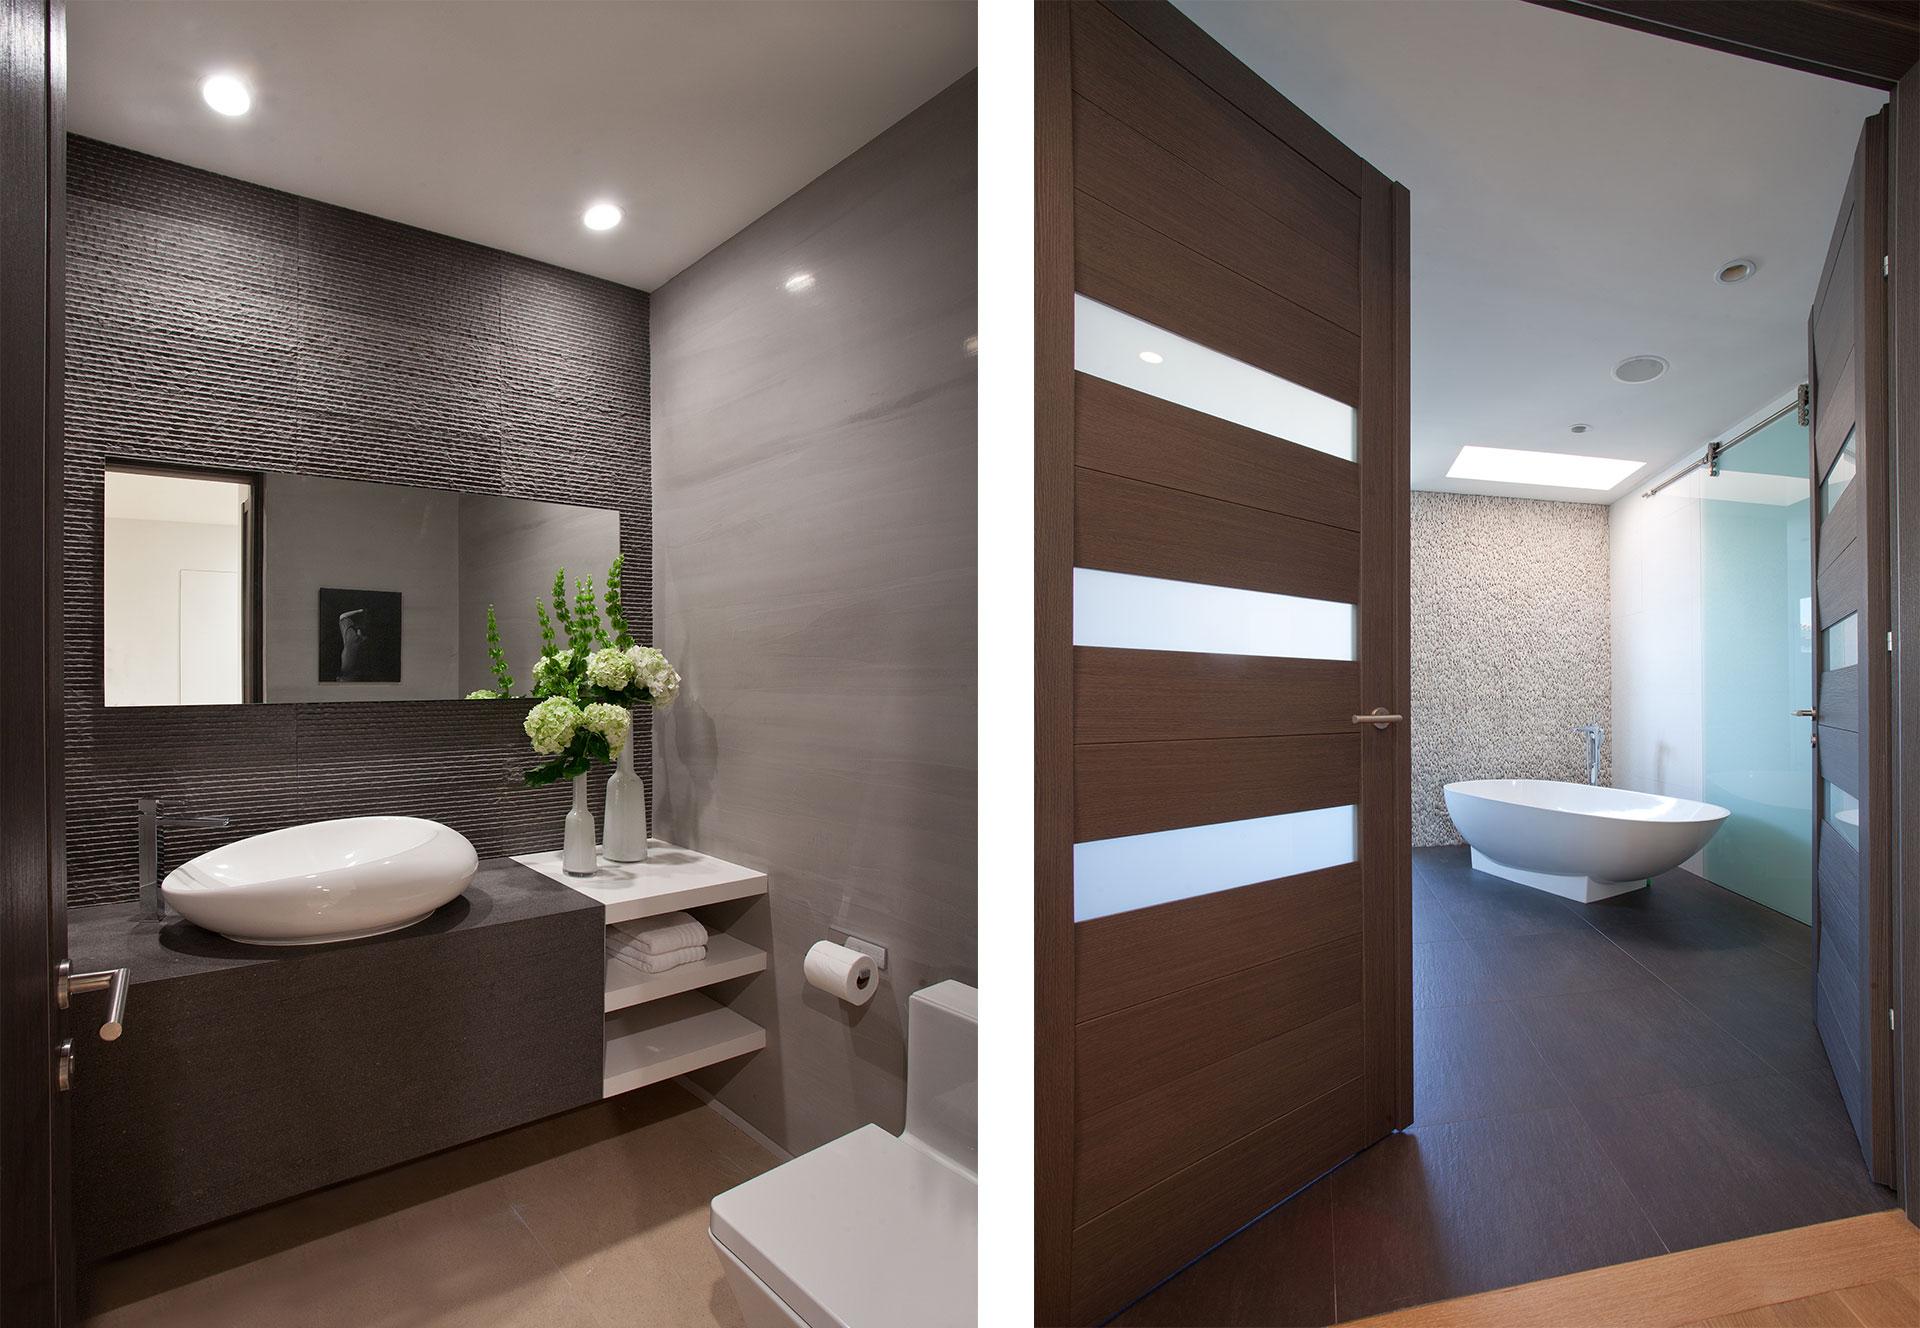 Interior Design bathroom view project in 96 Golden Beach Drive, Florida